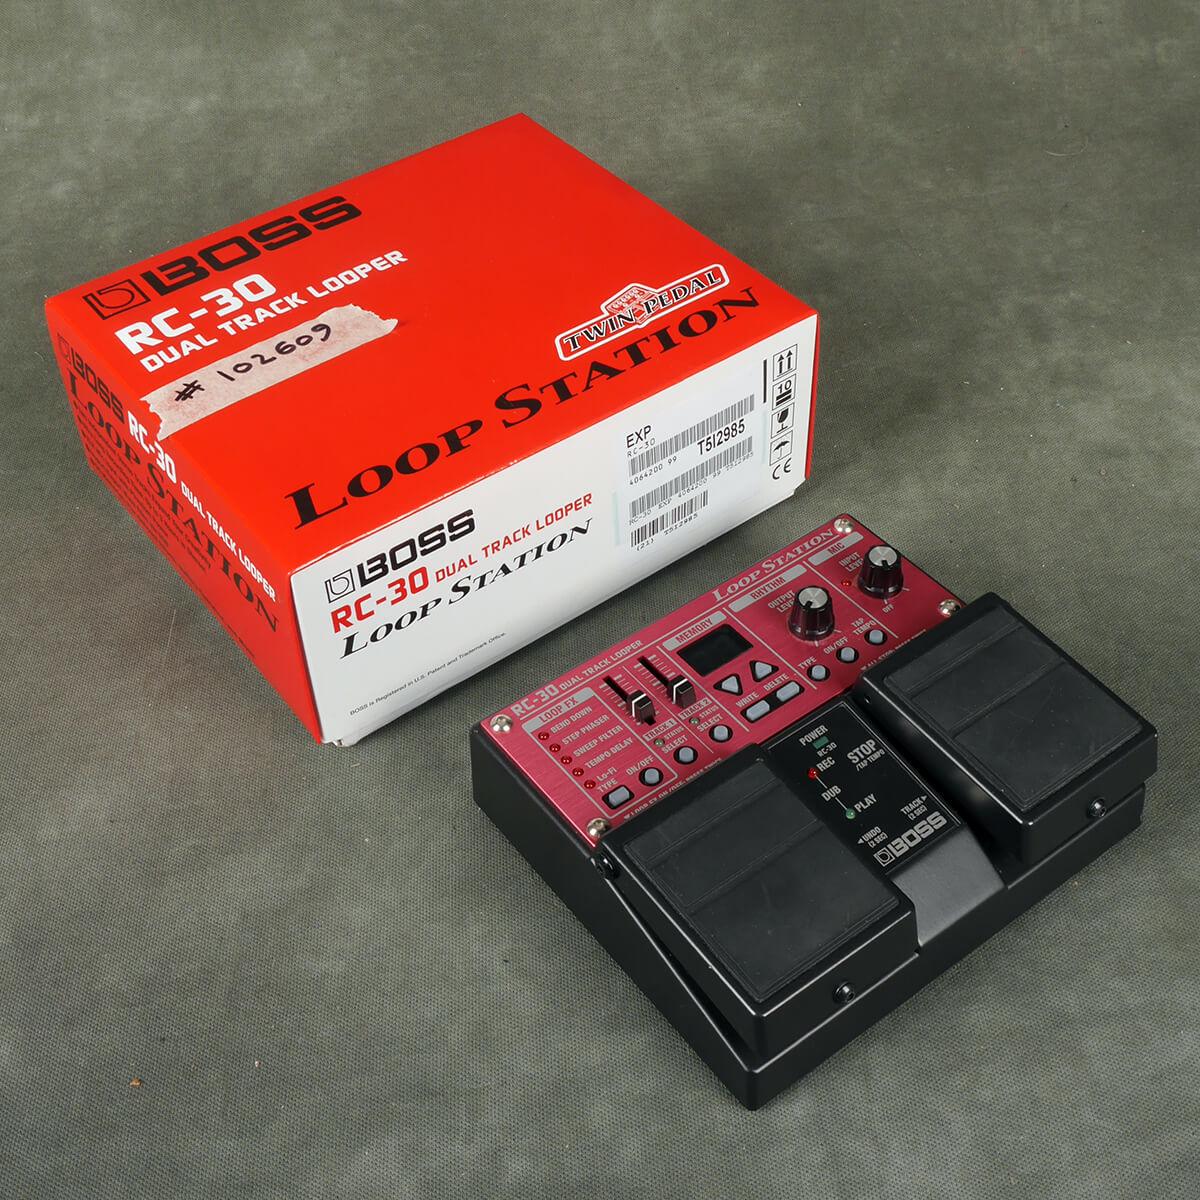 Boss RC-30 Looper FX Pedal w/Box - 2nd Hand